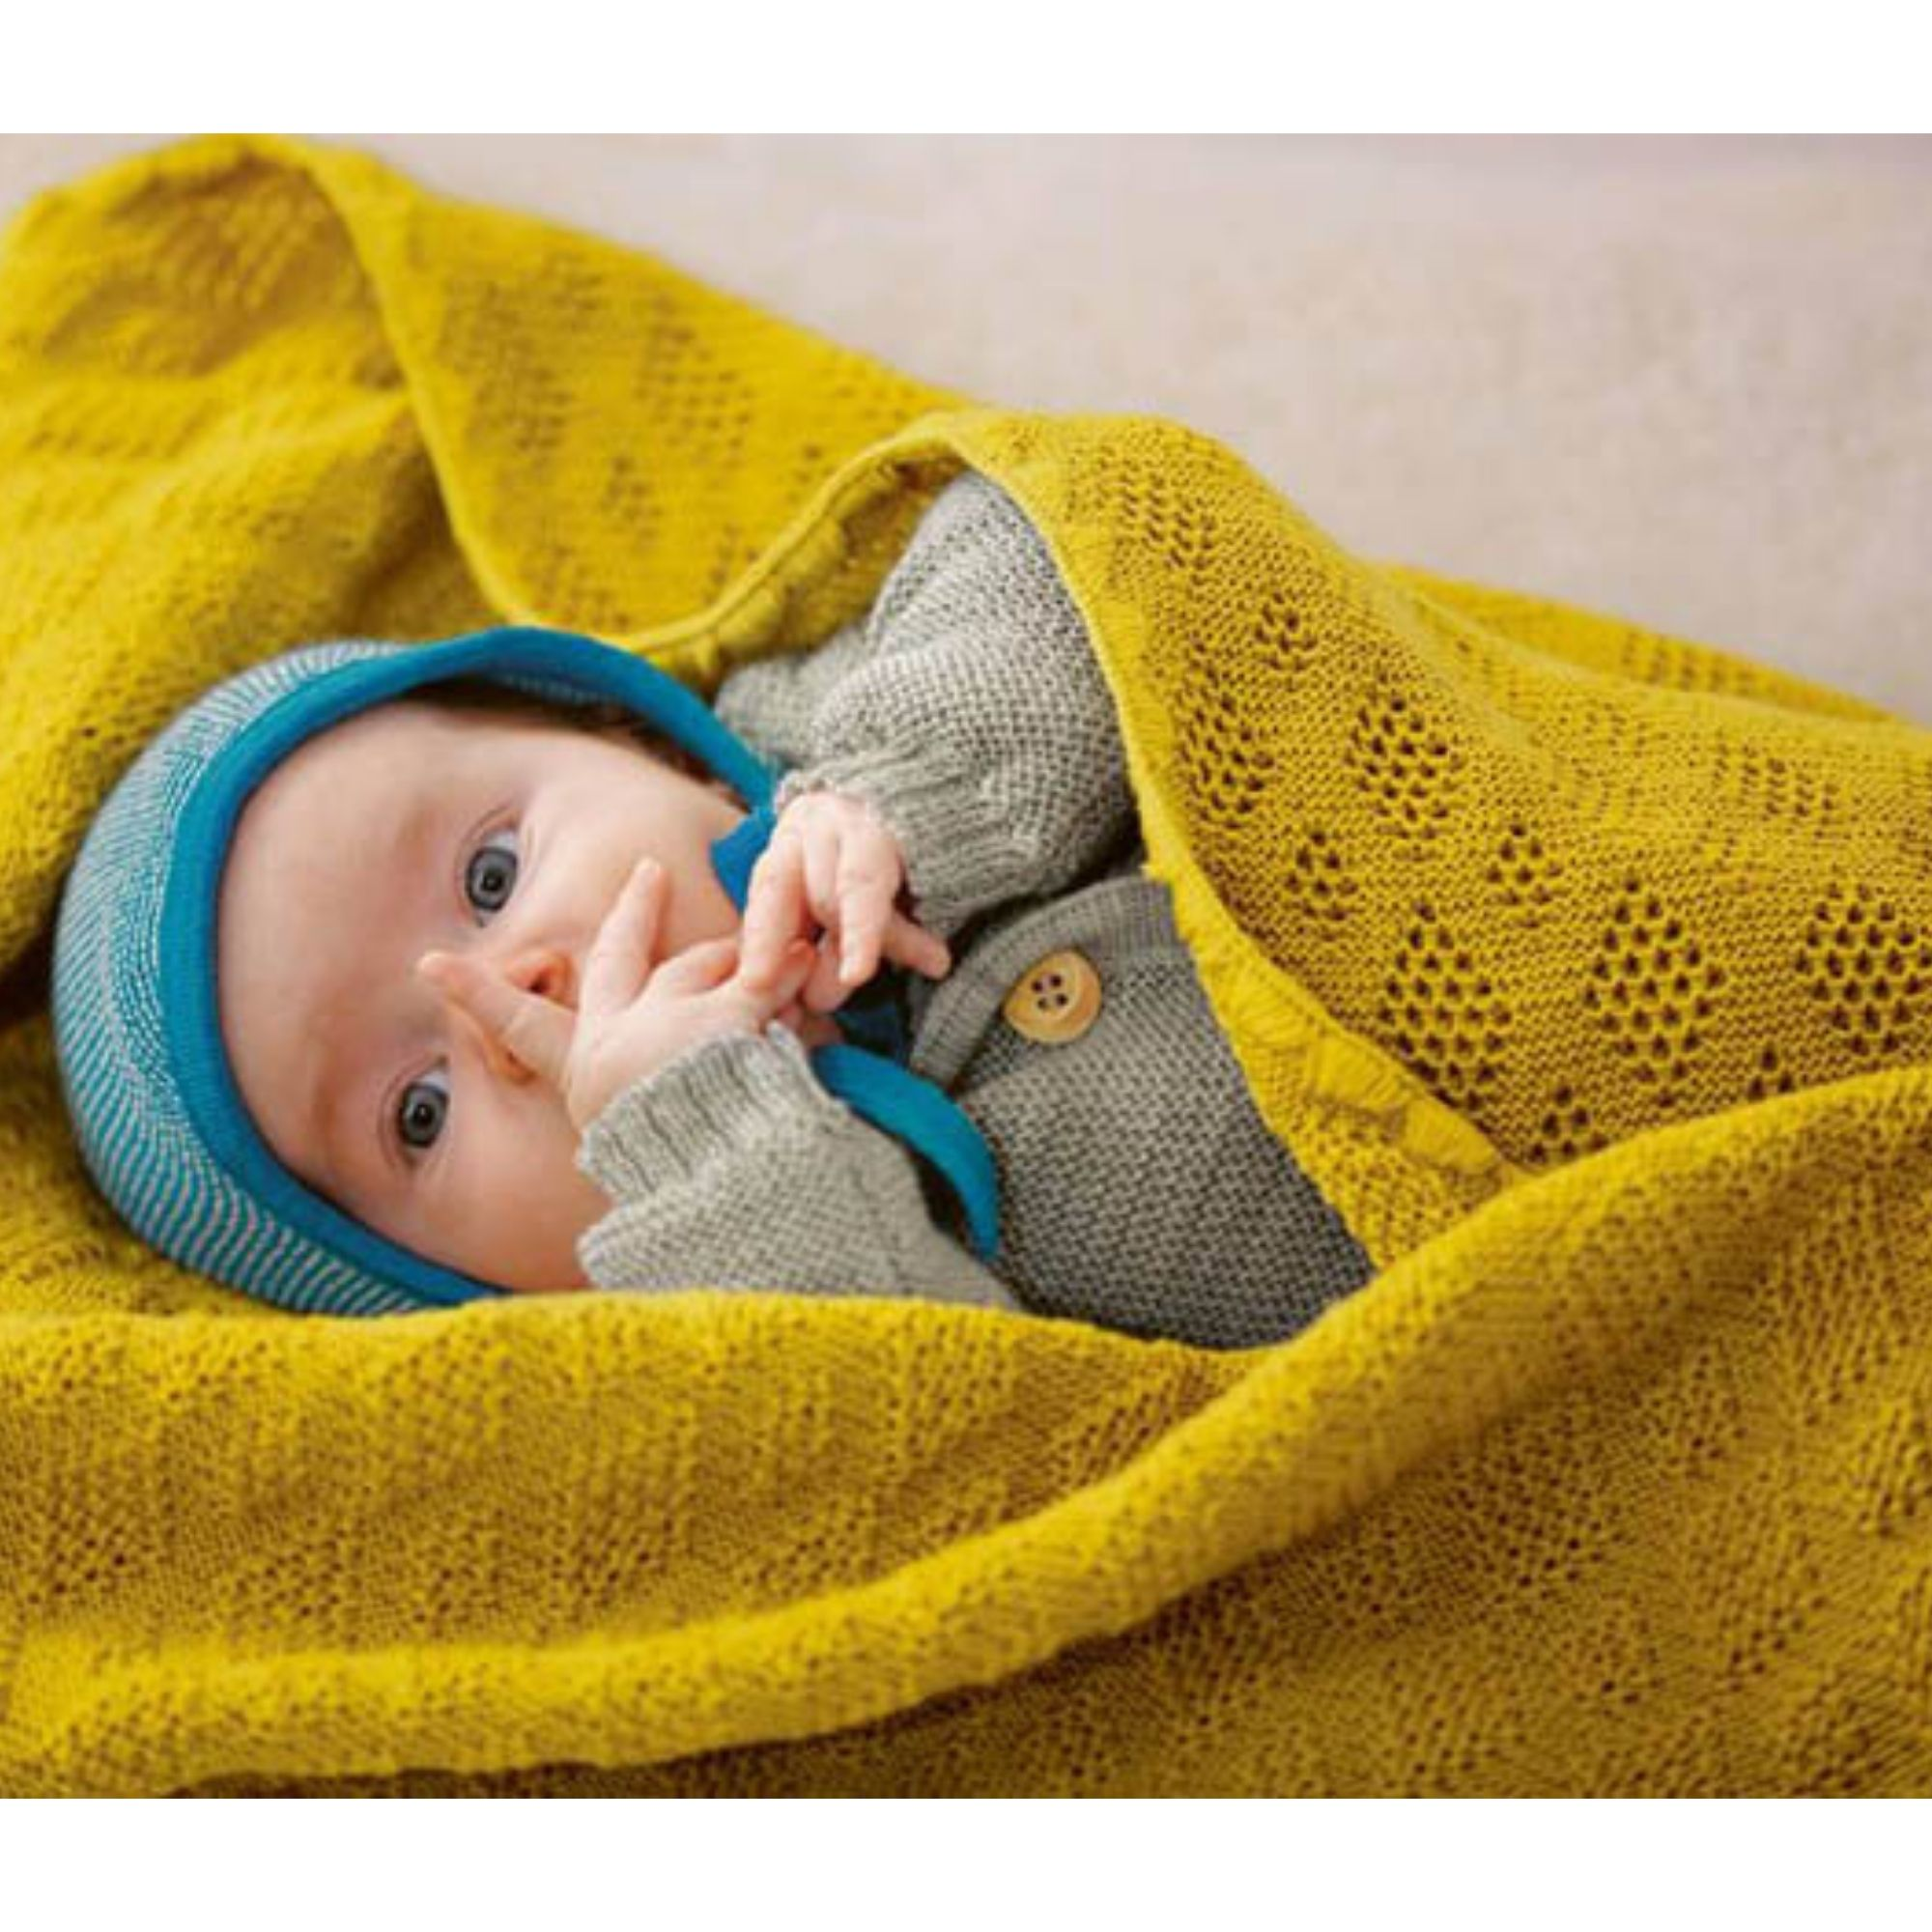 DISANA - Couverture tricotée - Laine mérinos - CURRY - ORIGINALE